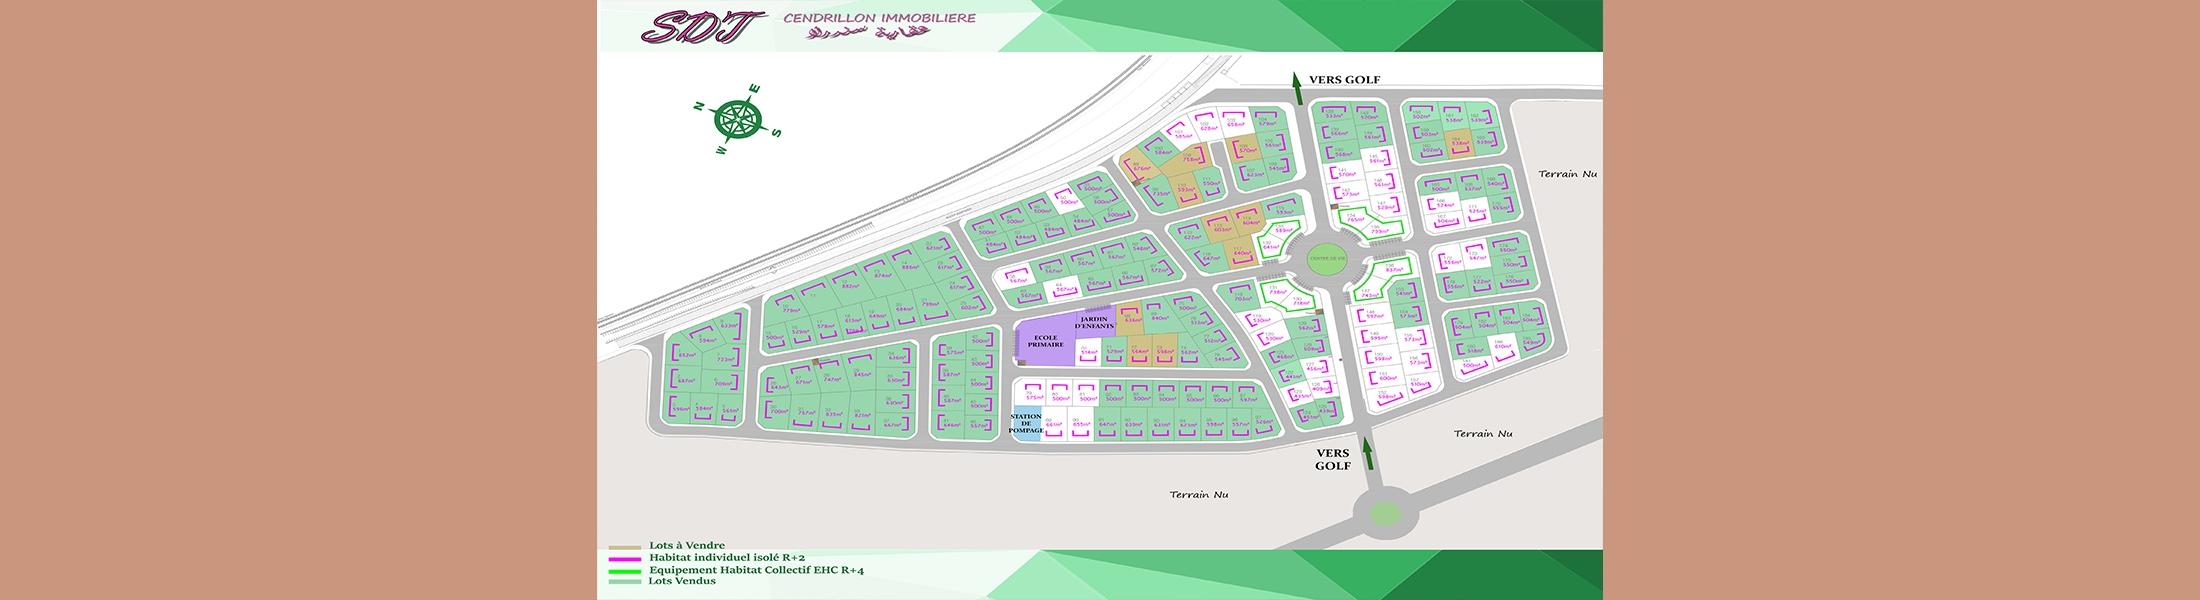 Vente des lots viabilisés à Monastir « Lotissement El Achaab Golf »